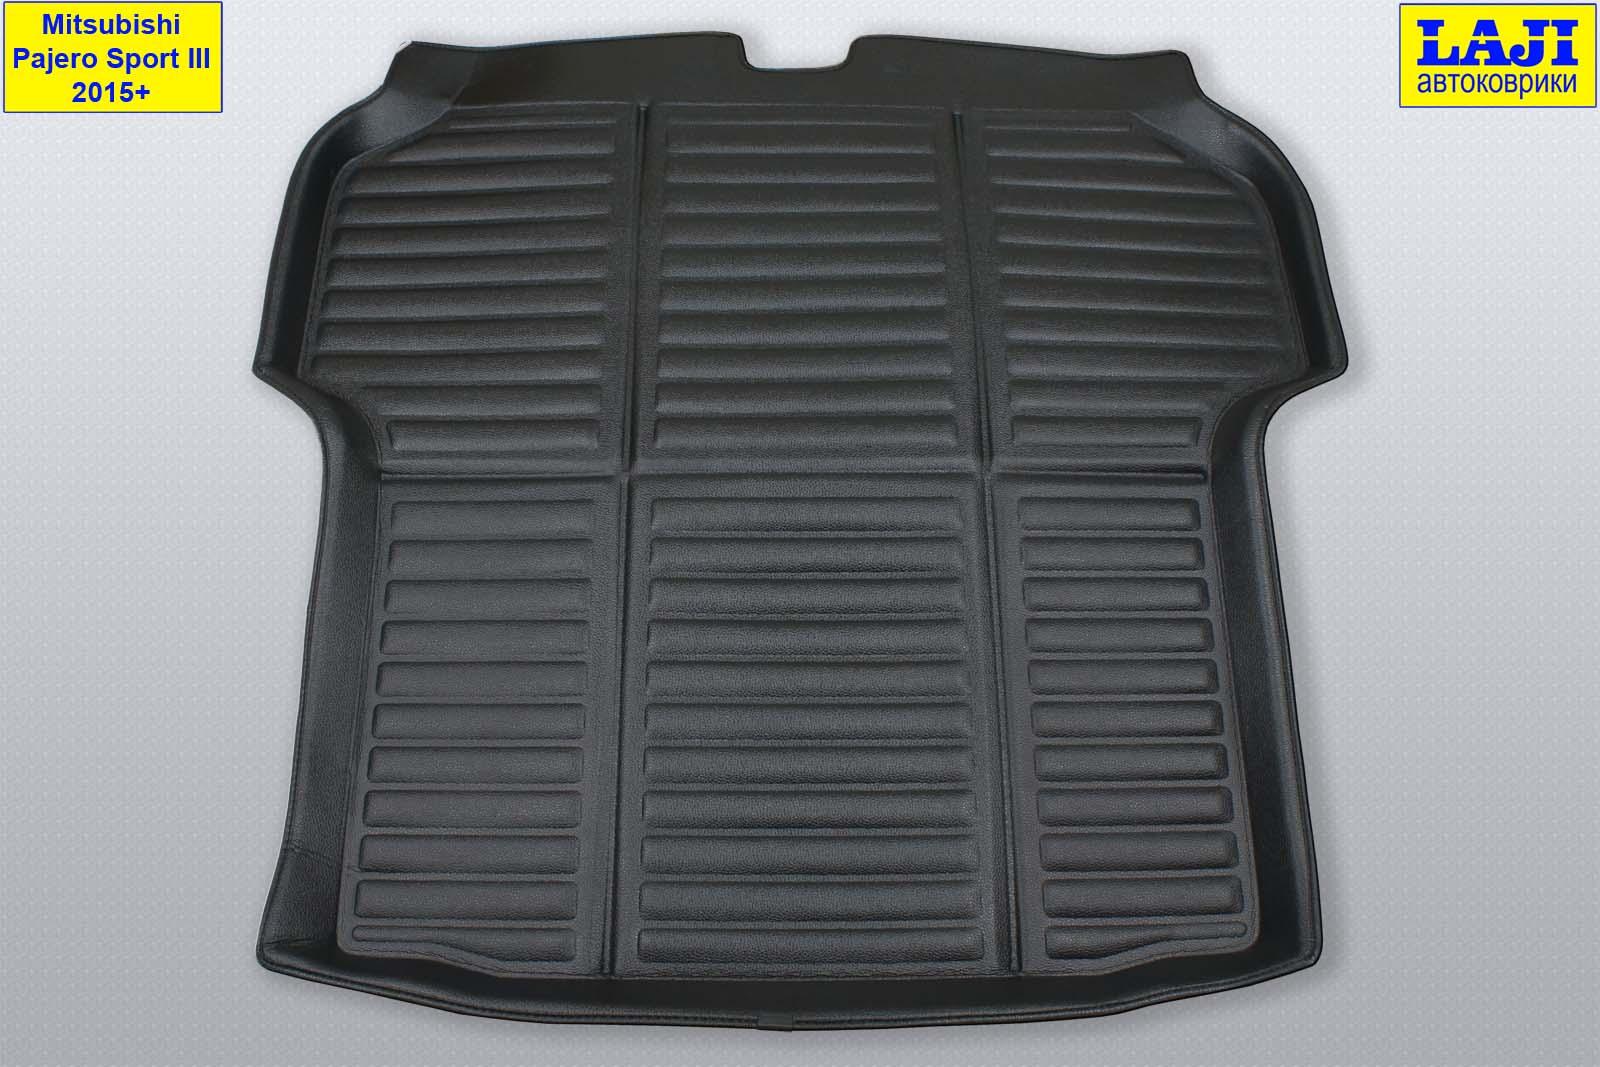 3D коврик в багажник Mitsubishi Pajero Sport III 2015-н.в. 2